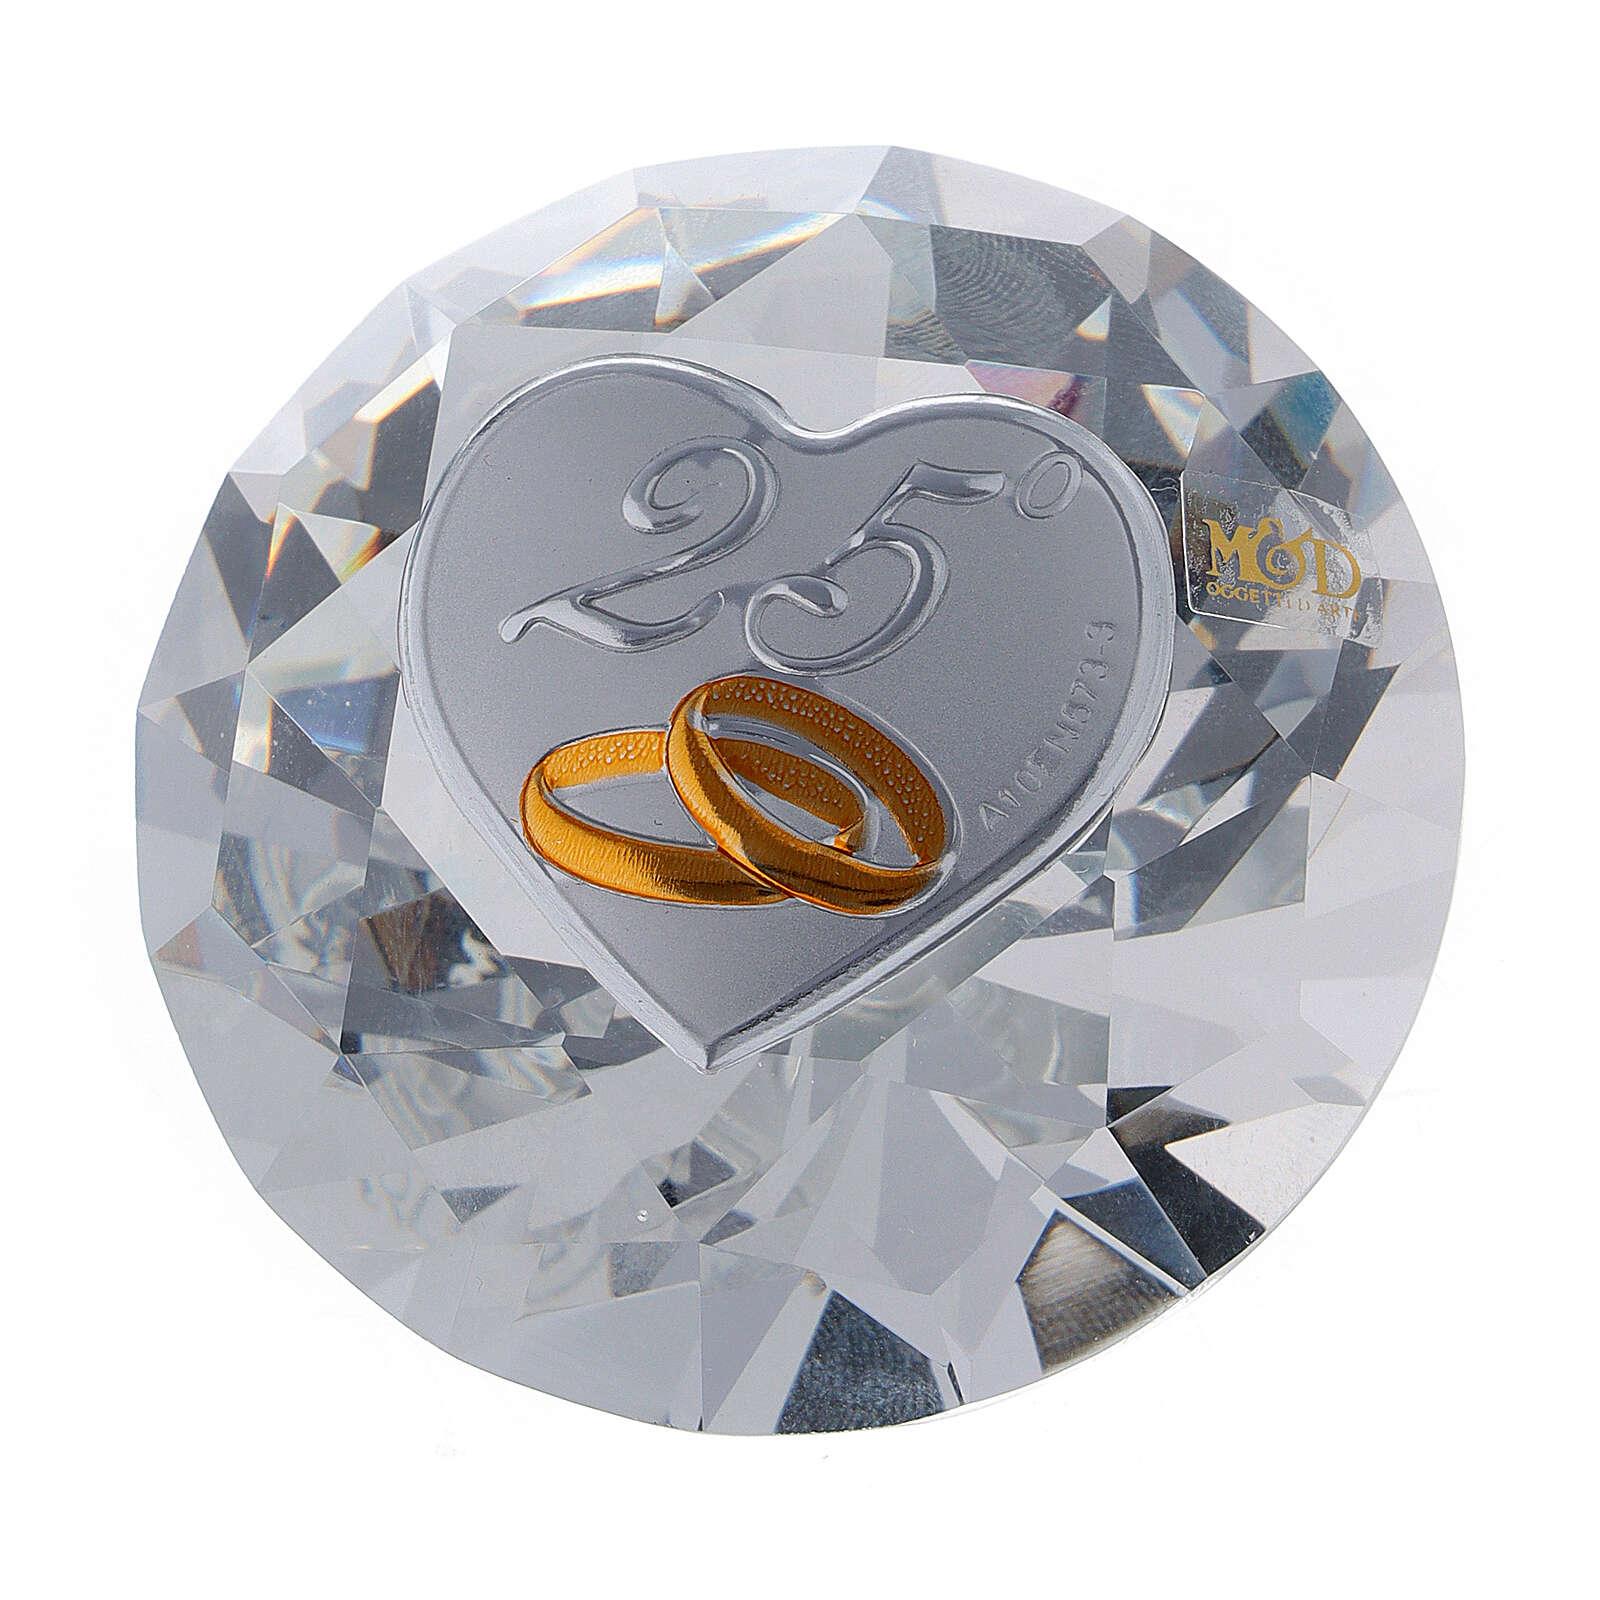 Diamante vidrio recuerdo bodas de plata 3